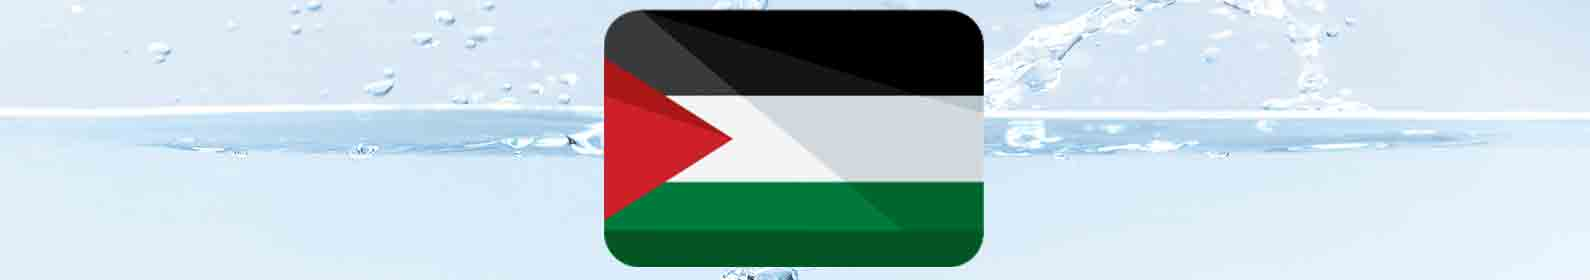 tratamento-de-agua-palestina.jpg